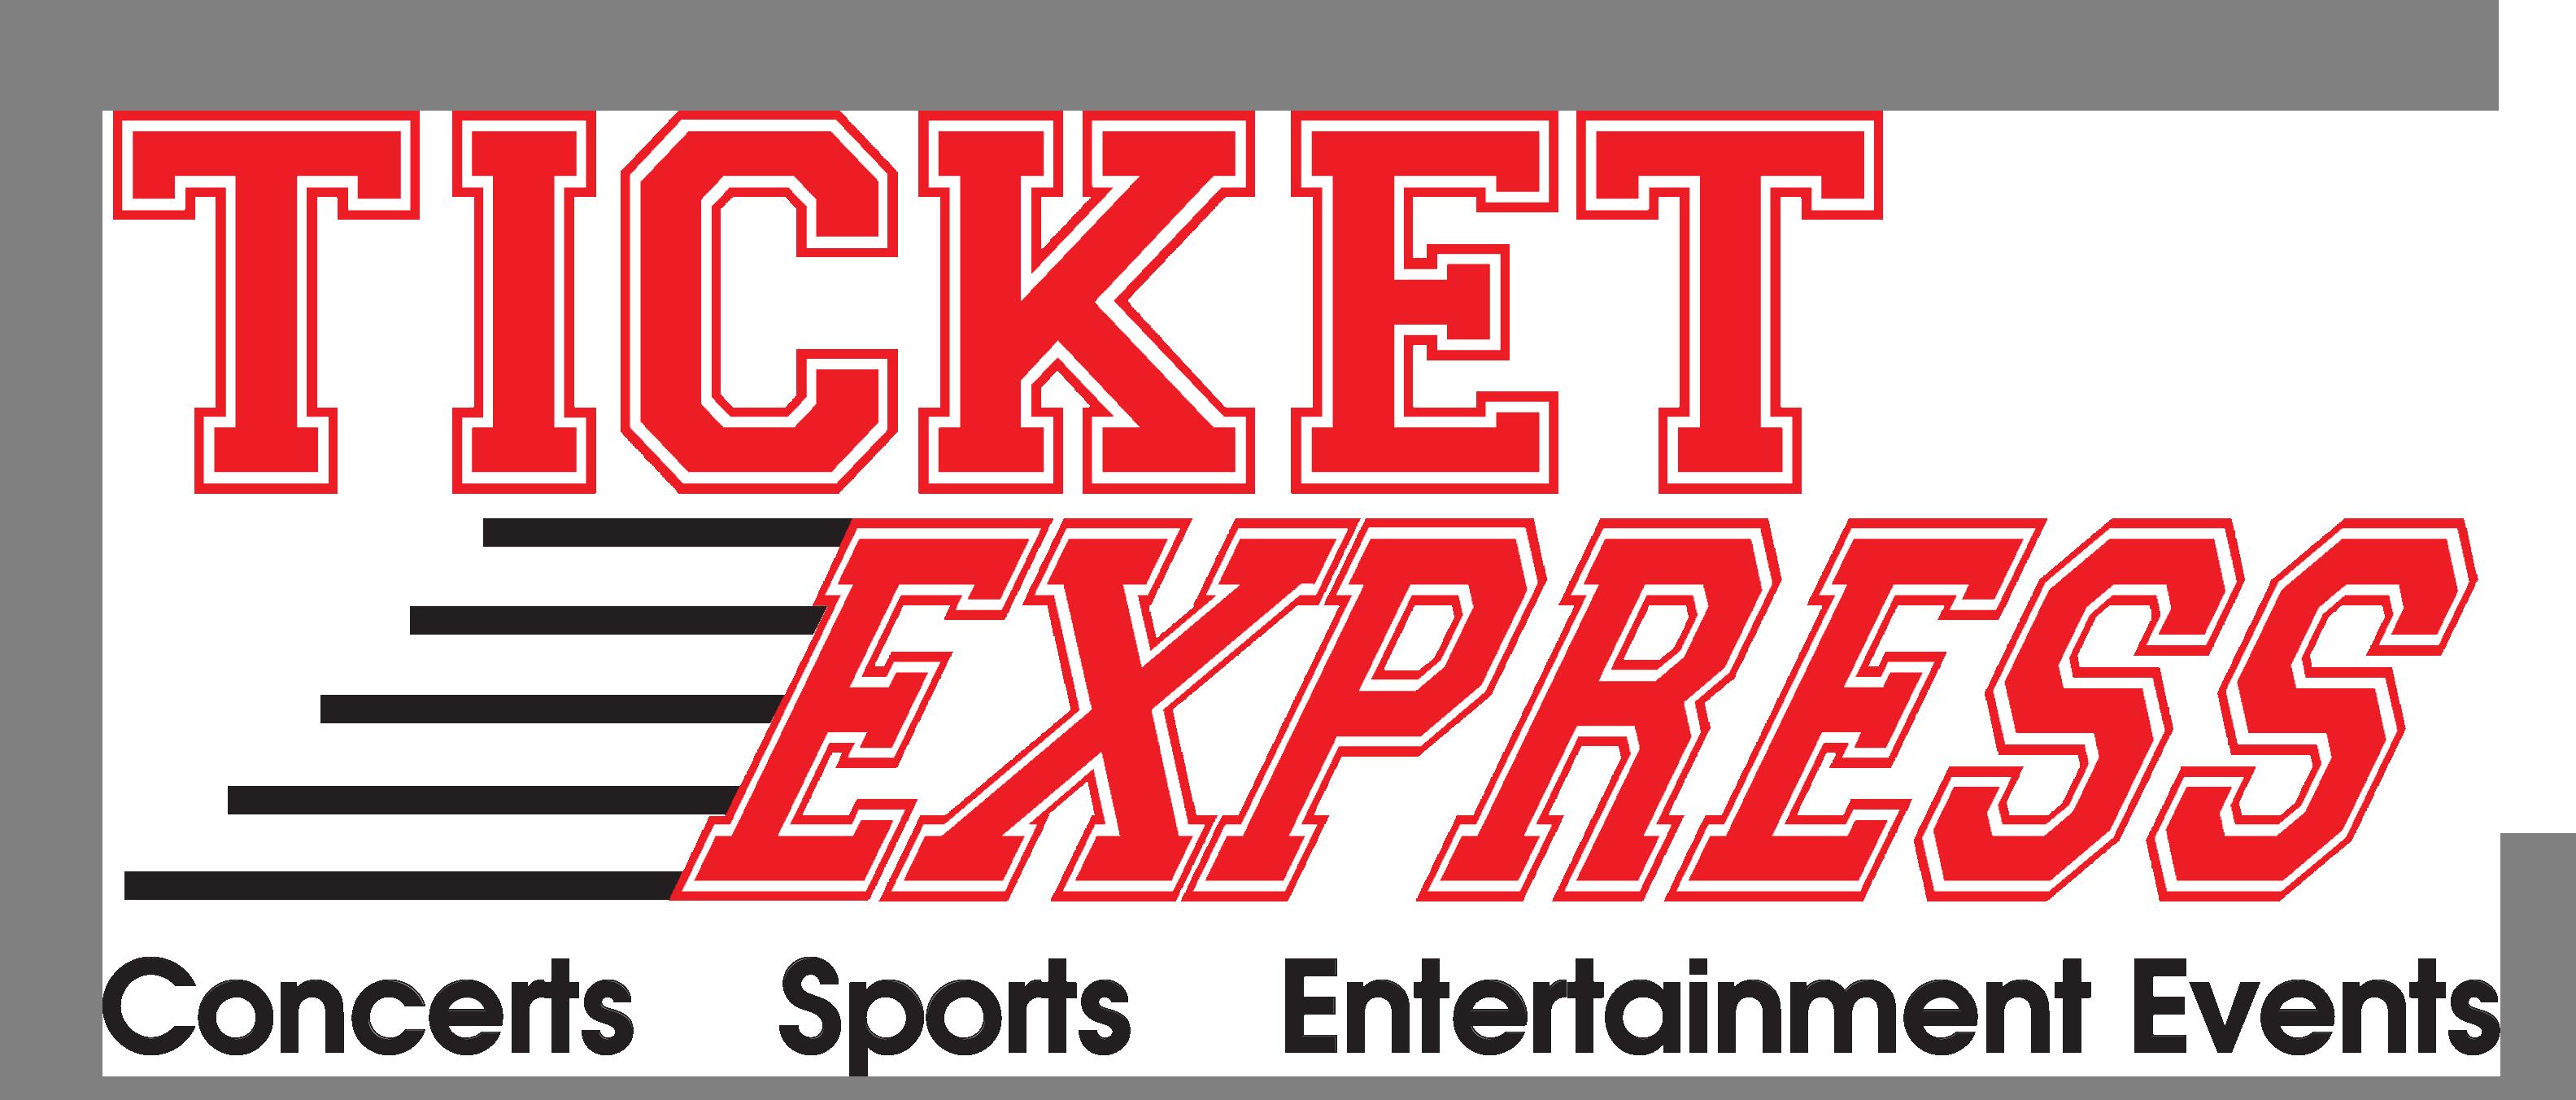 Ticket Express Logo - Clear Background - Black (1)